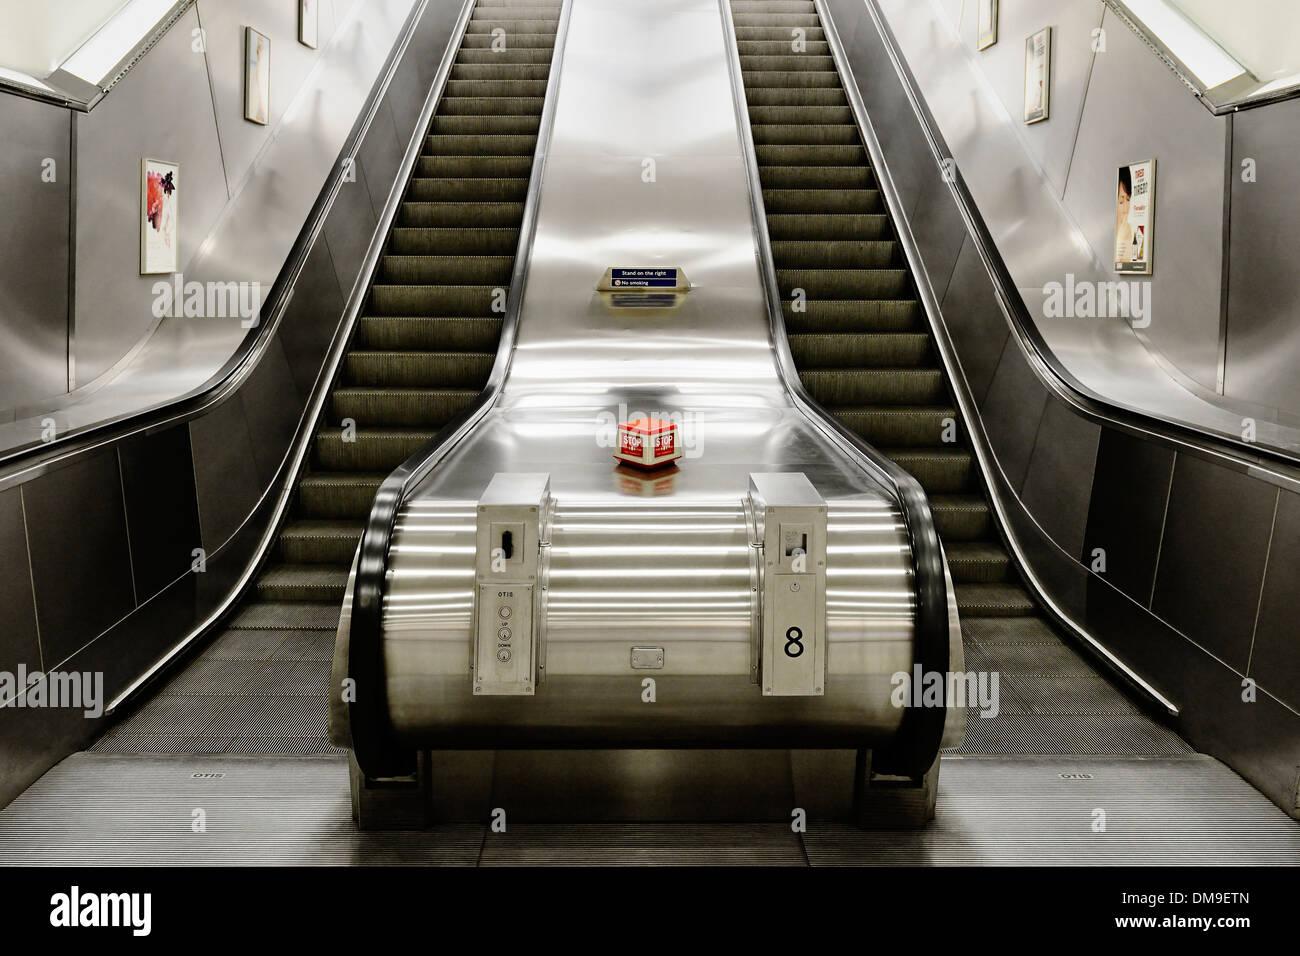 Escalator in an Underground Station, London, UK. - Stock Image